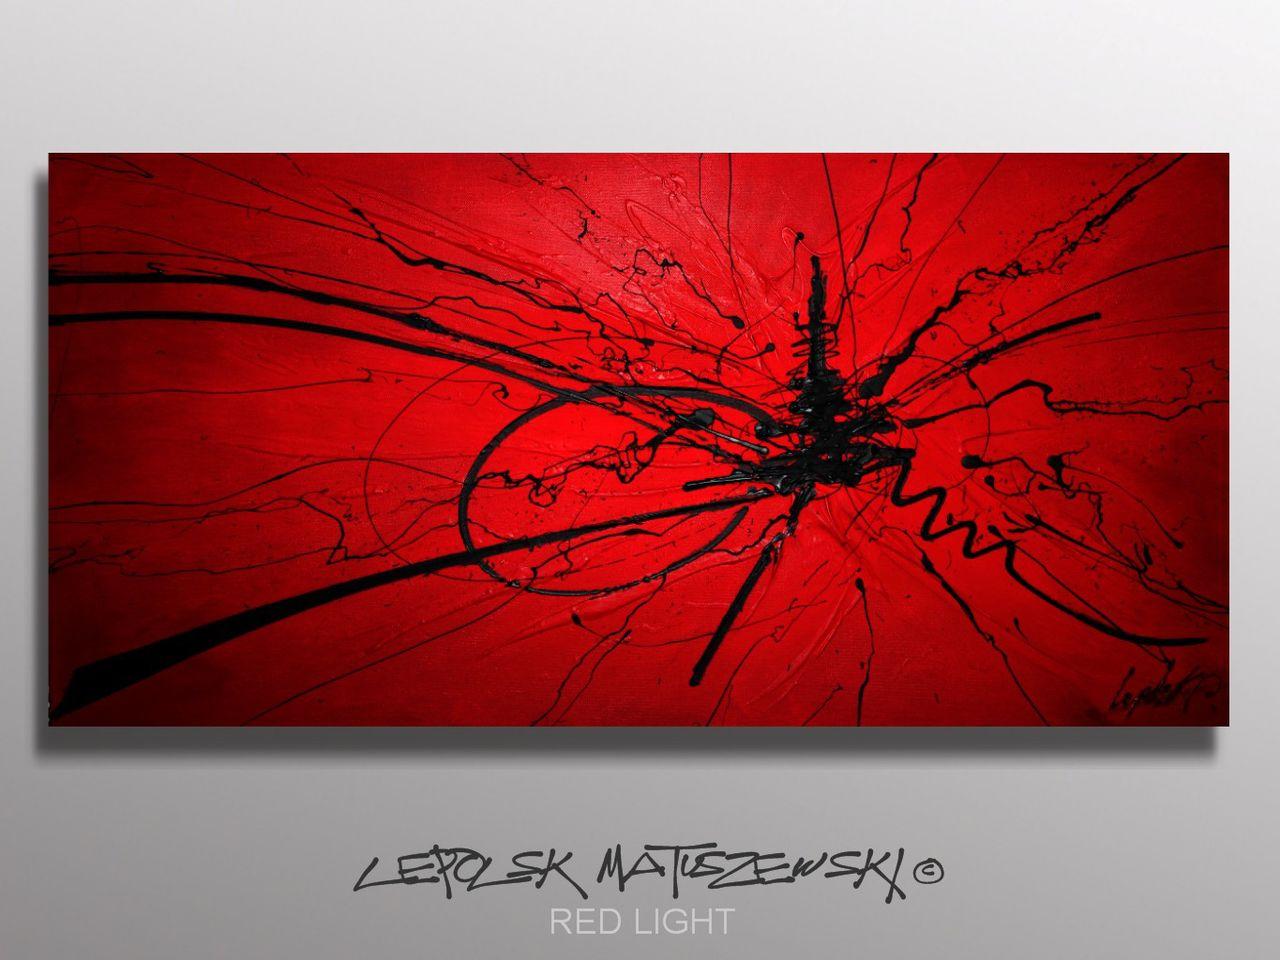 MISTER K  (Lepolsk Matuszewski) RED LIGHT   Expressionnisme abstrait contemporain